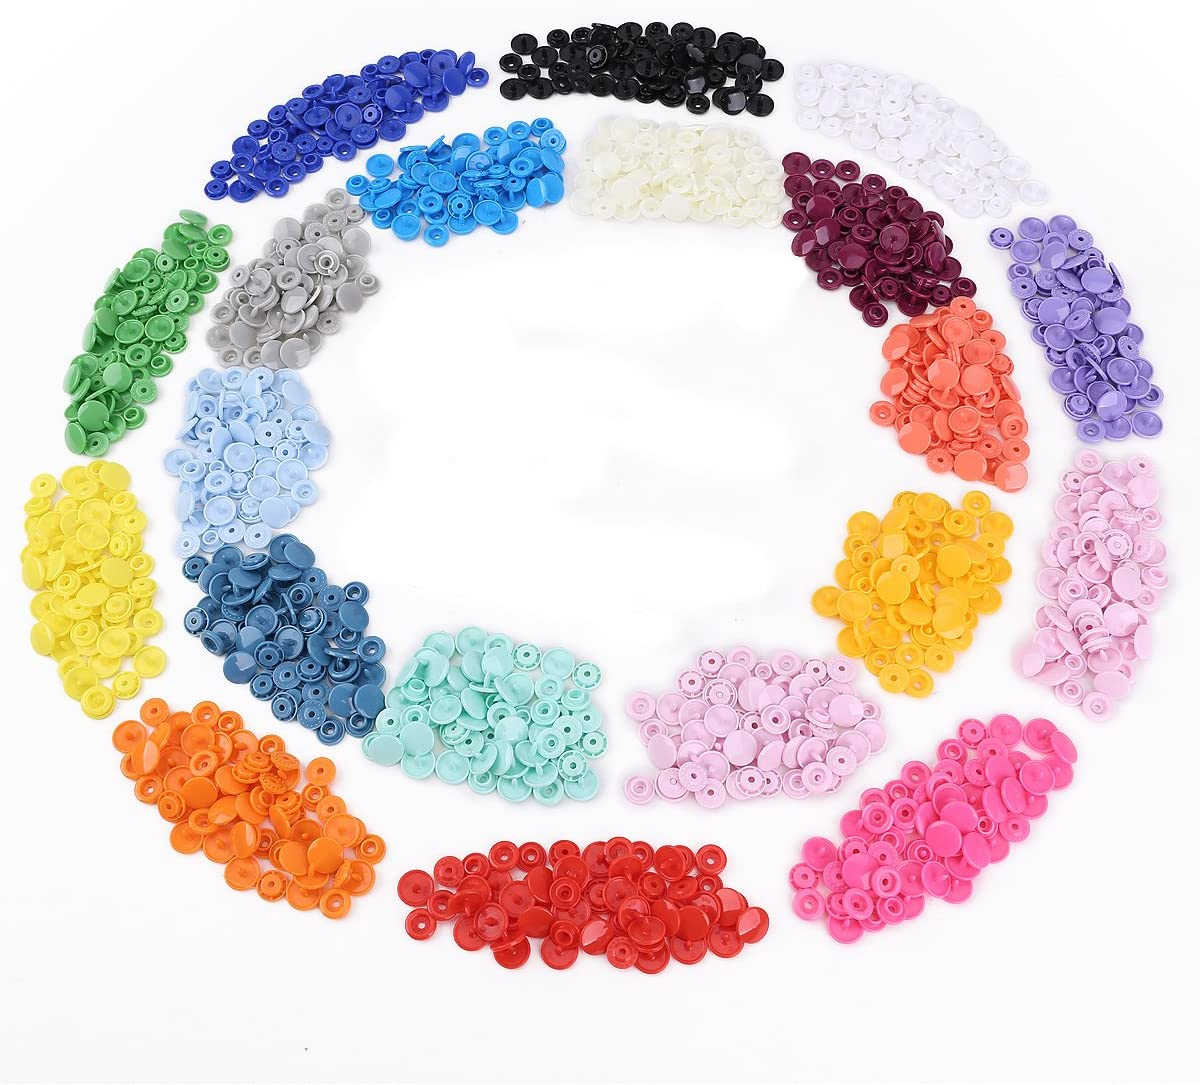 300pcs T5 Snaps Botón Plastico Redondo para DIY Manualidades #718